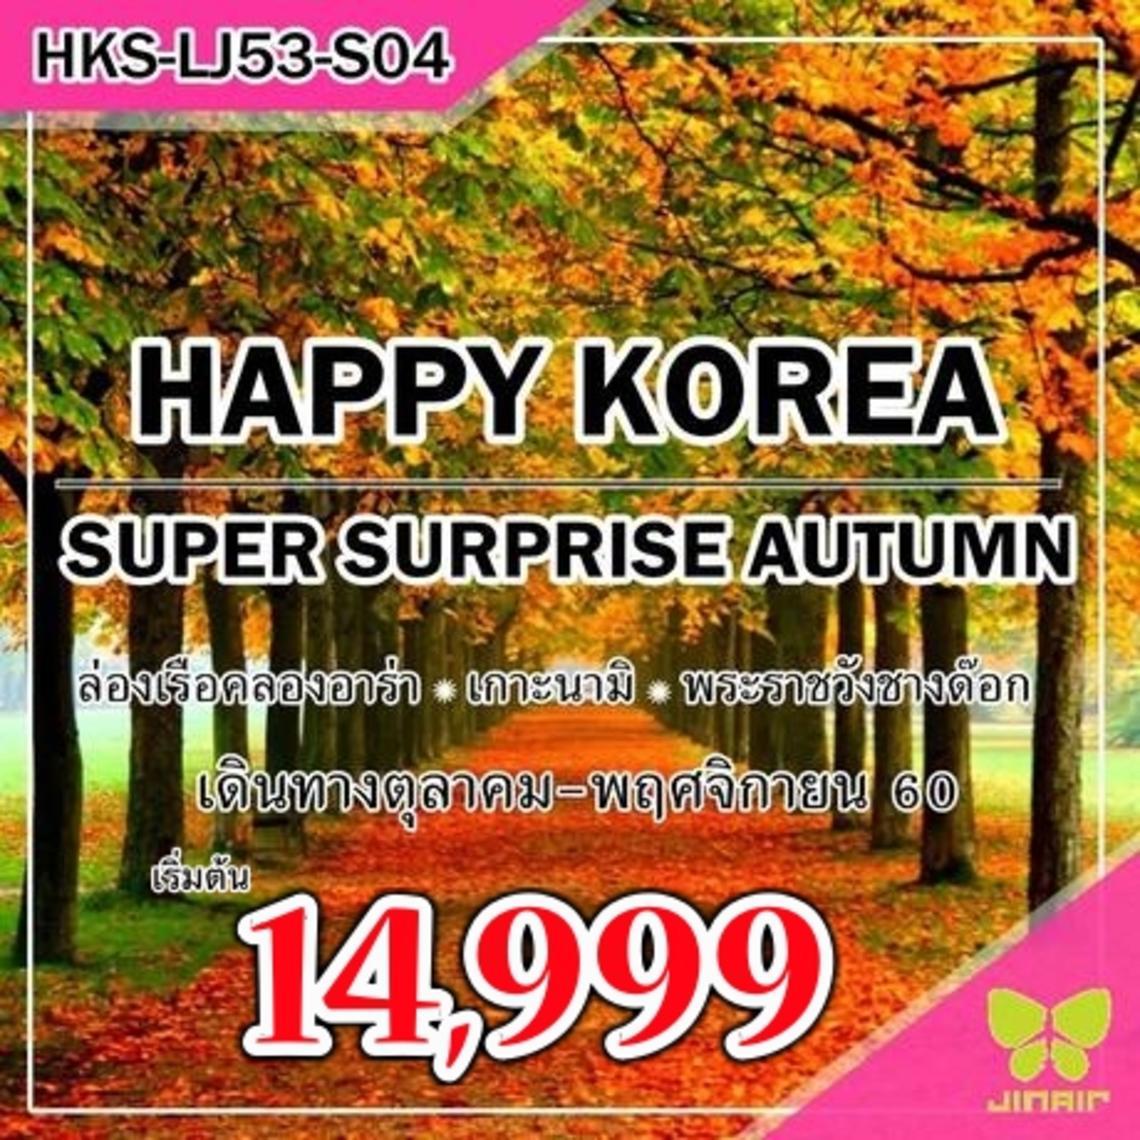 HKS-LJ53-S04 HAPPY KOREA SUPER SURPRISE AUTUMN 5D3N (OCTOBER-NOVEMBER 2017)